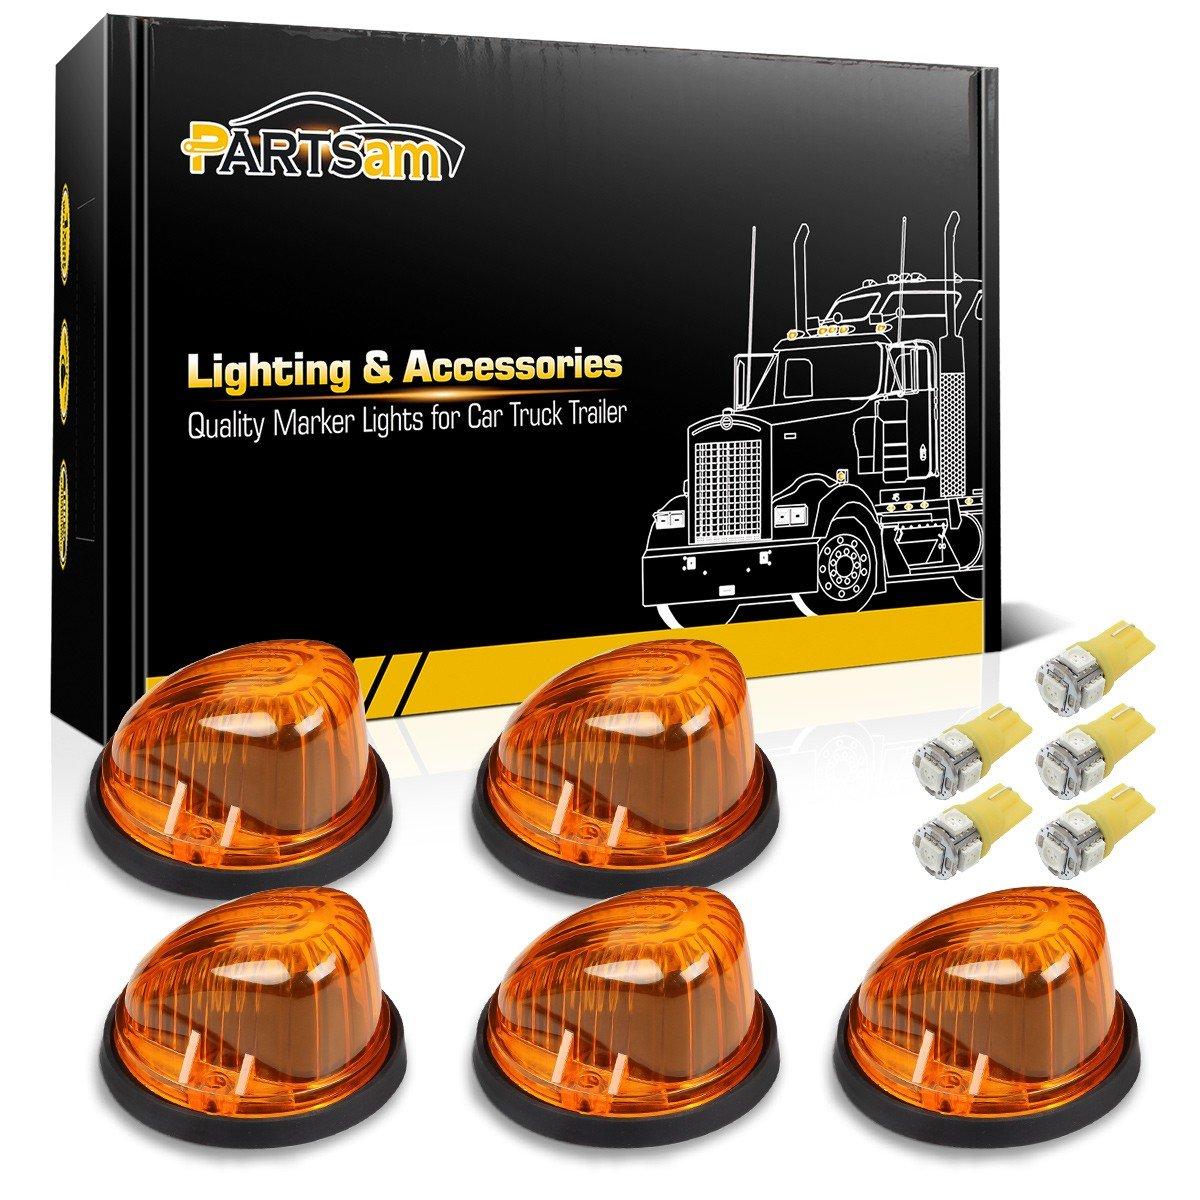 Partsam 5X Cab Marker Light Marker 1313A Amber Lens + 5X Amber T10 LED Bulbs + Base Compatible with Chevrolet/GMC/Dually Suburban Blazer C1500 C2500 C3500 K1500 K2500 K3500 1969-1987 Pickup Trucks by Partsam